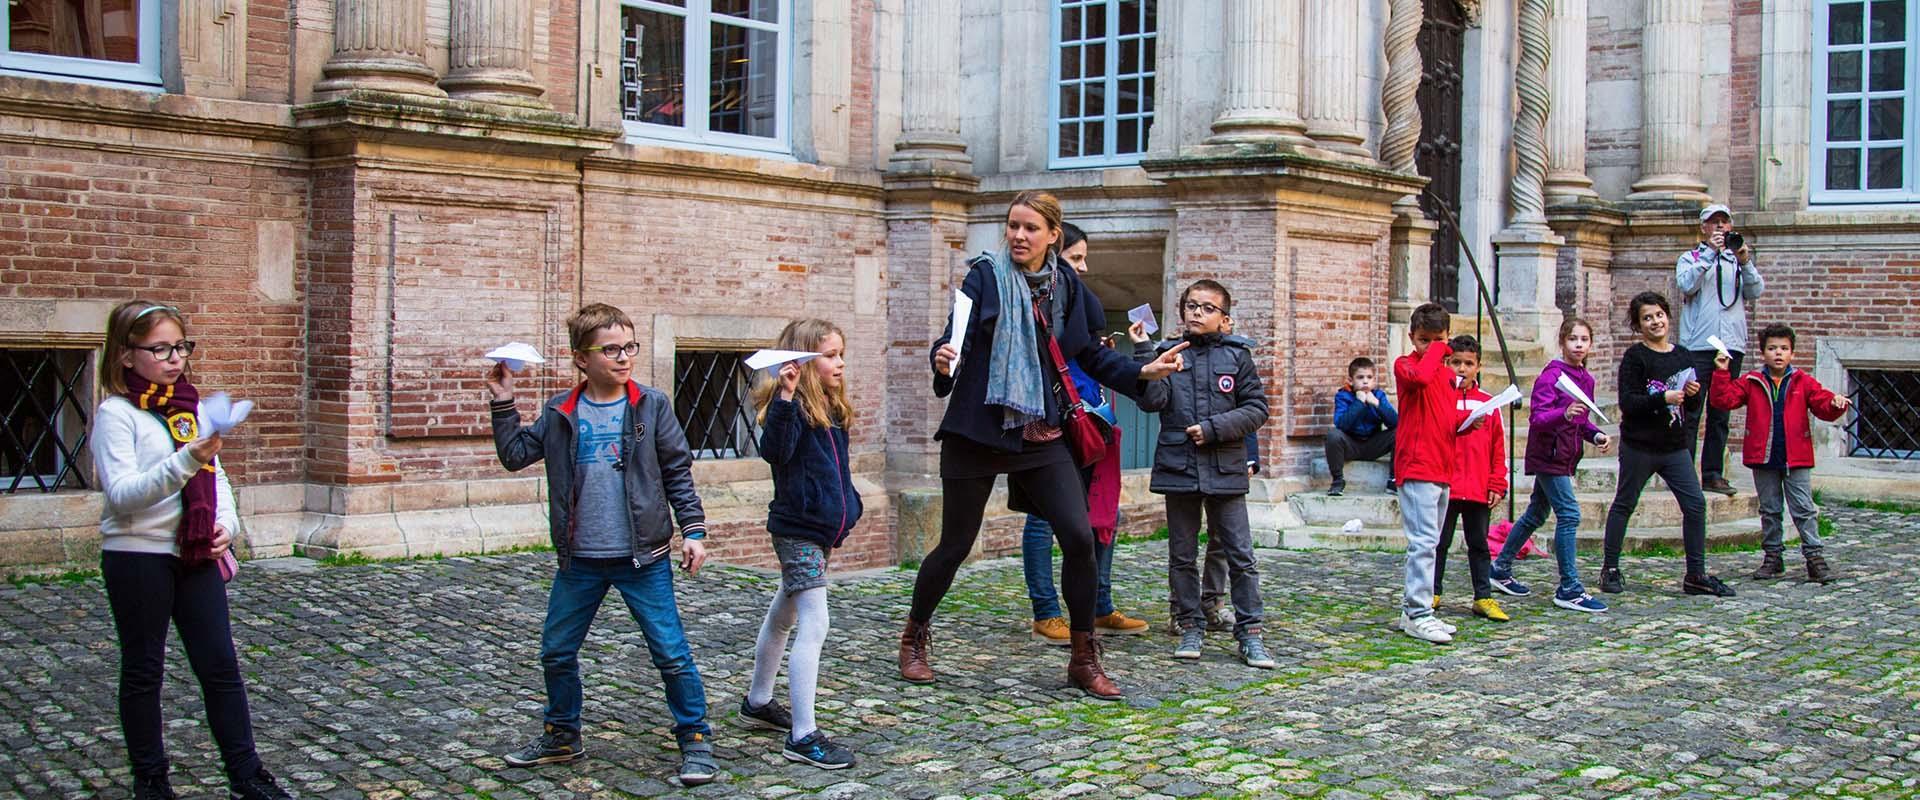 Visiter Toulouse en jouant ©angeliquegophotography